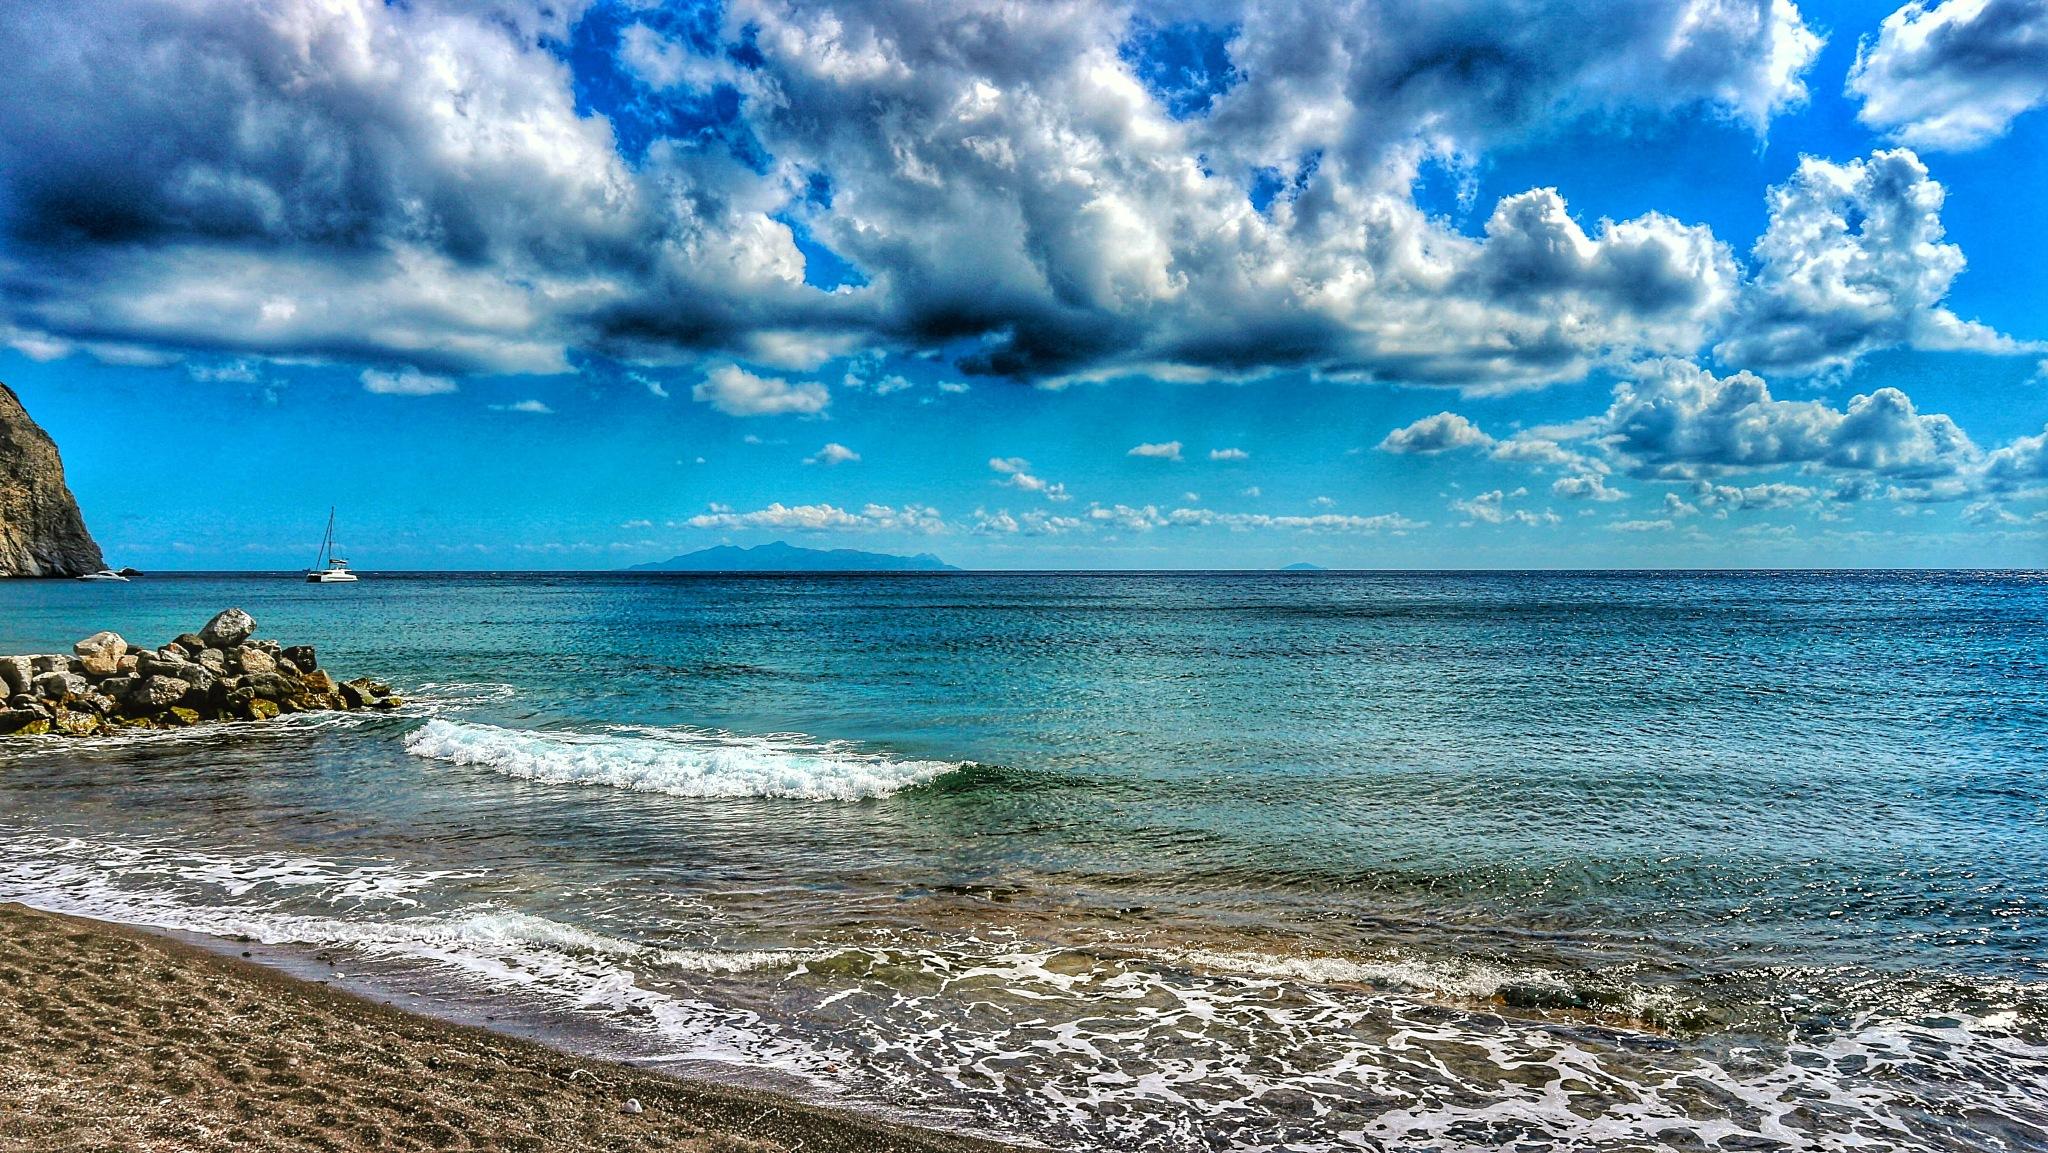 beach life by Laconic Photo